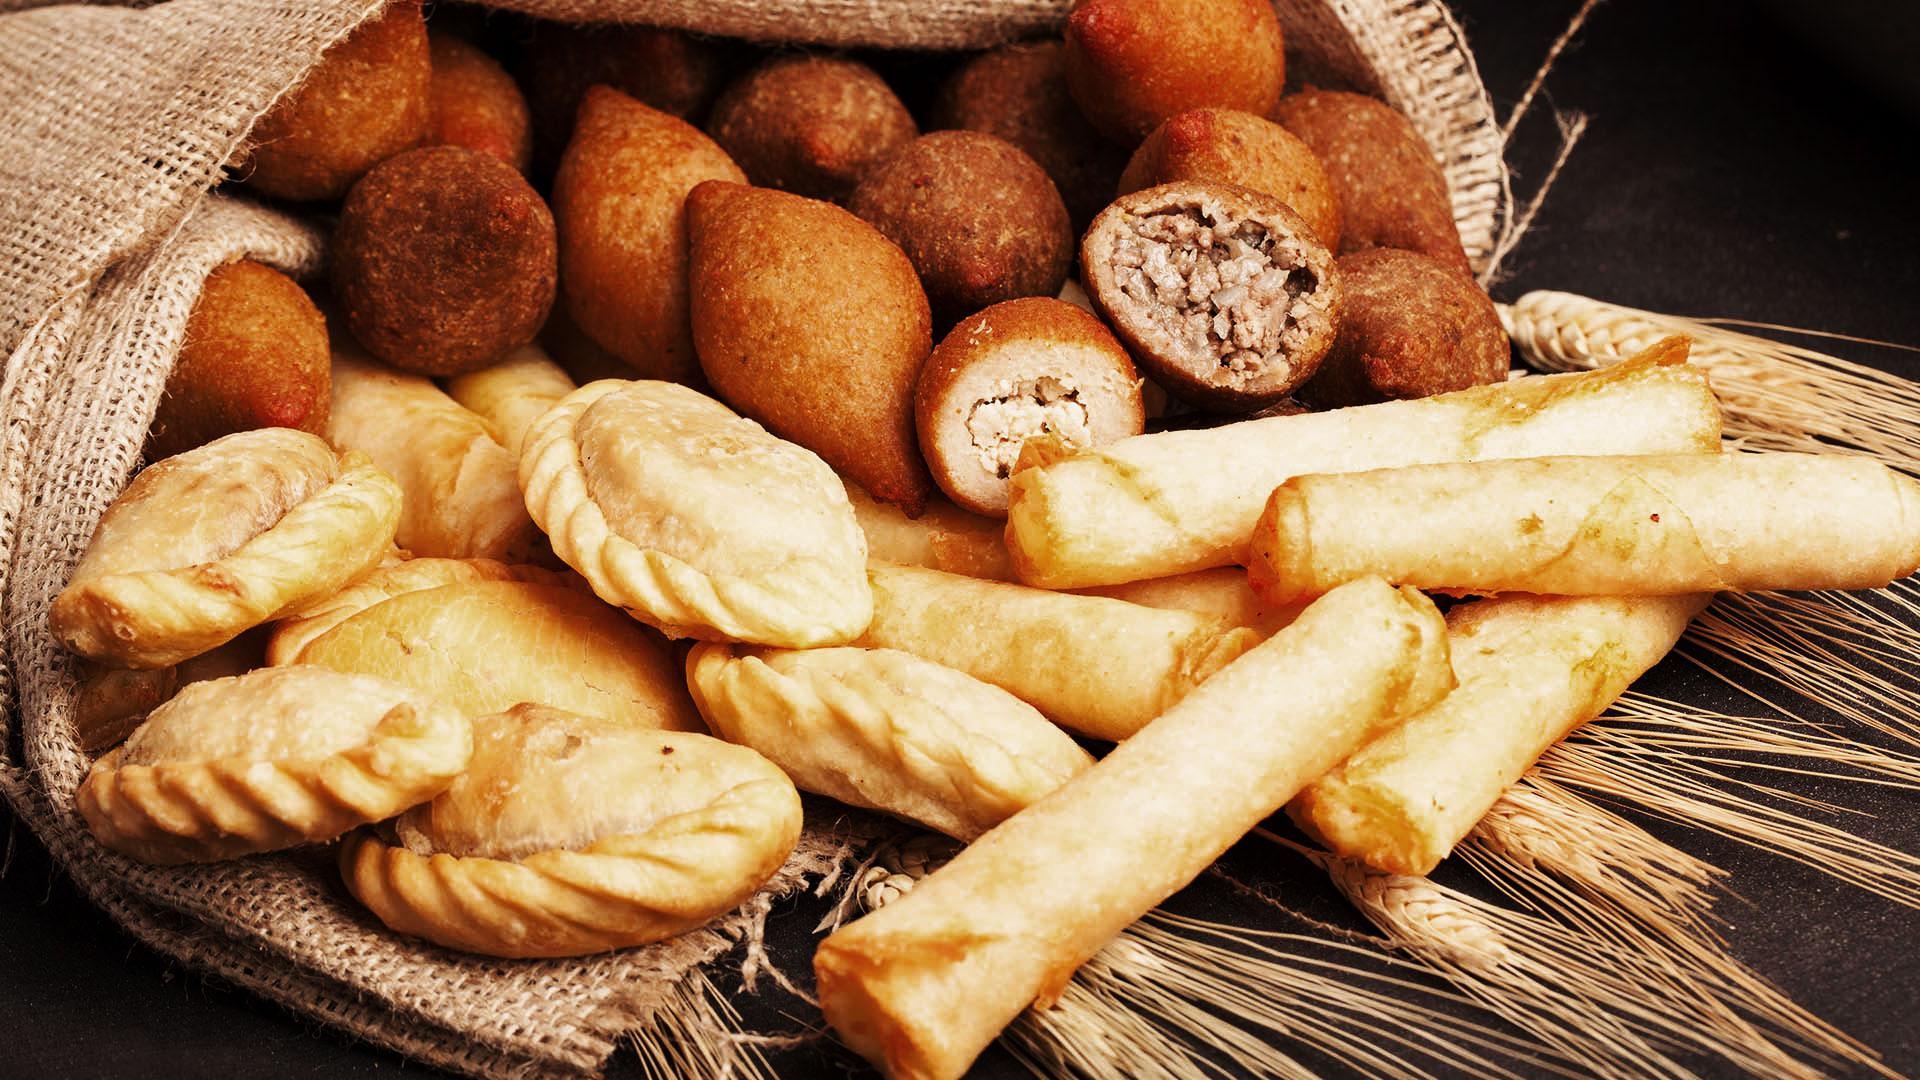 libanesisches Brot